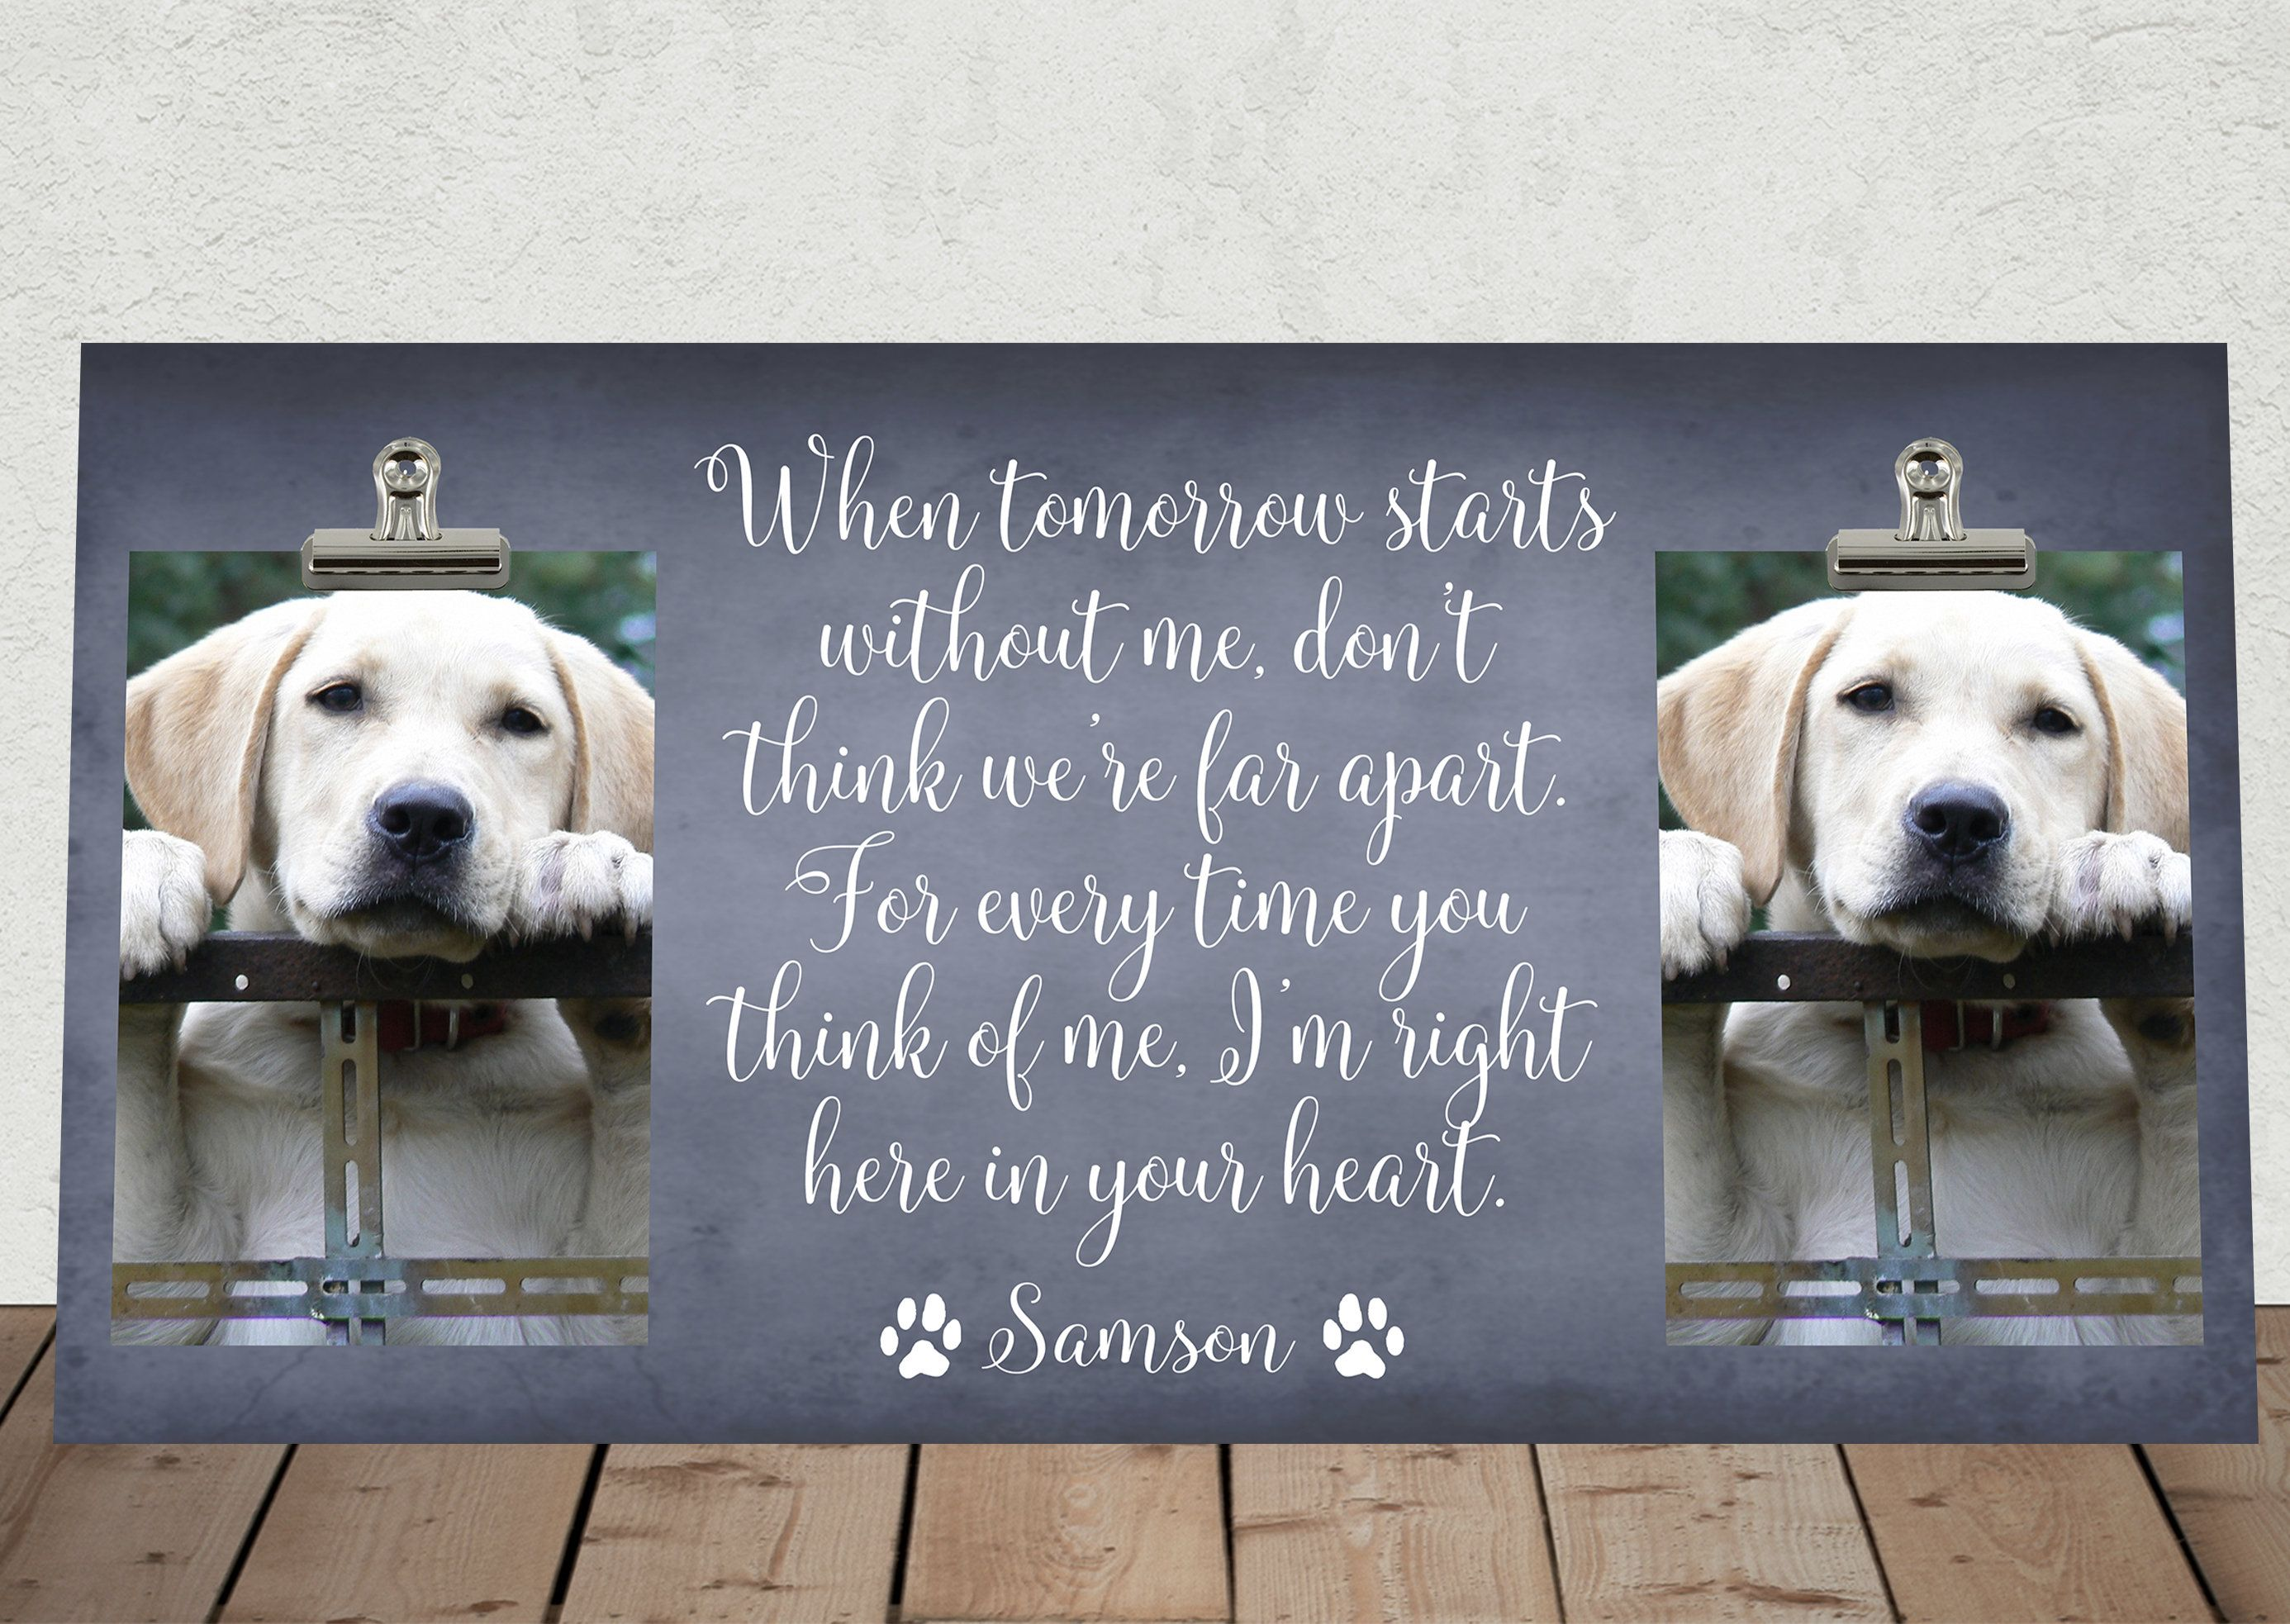 Pet Memorial Frame When Tomorrow Starts Without Me 8 X16 Bereavement Free Personalization Pet Loss Gift Cat Dog Sympathy Wt01 Pet Memorials Pet Memorial Frames Pet Loss Gifts